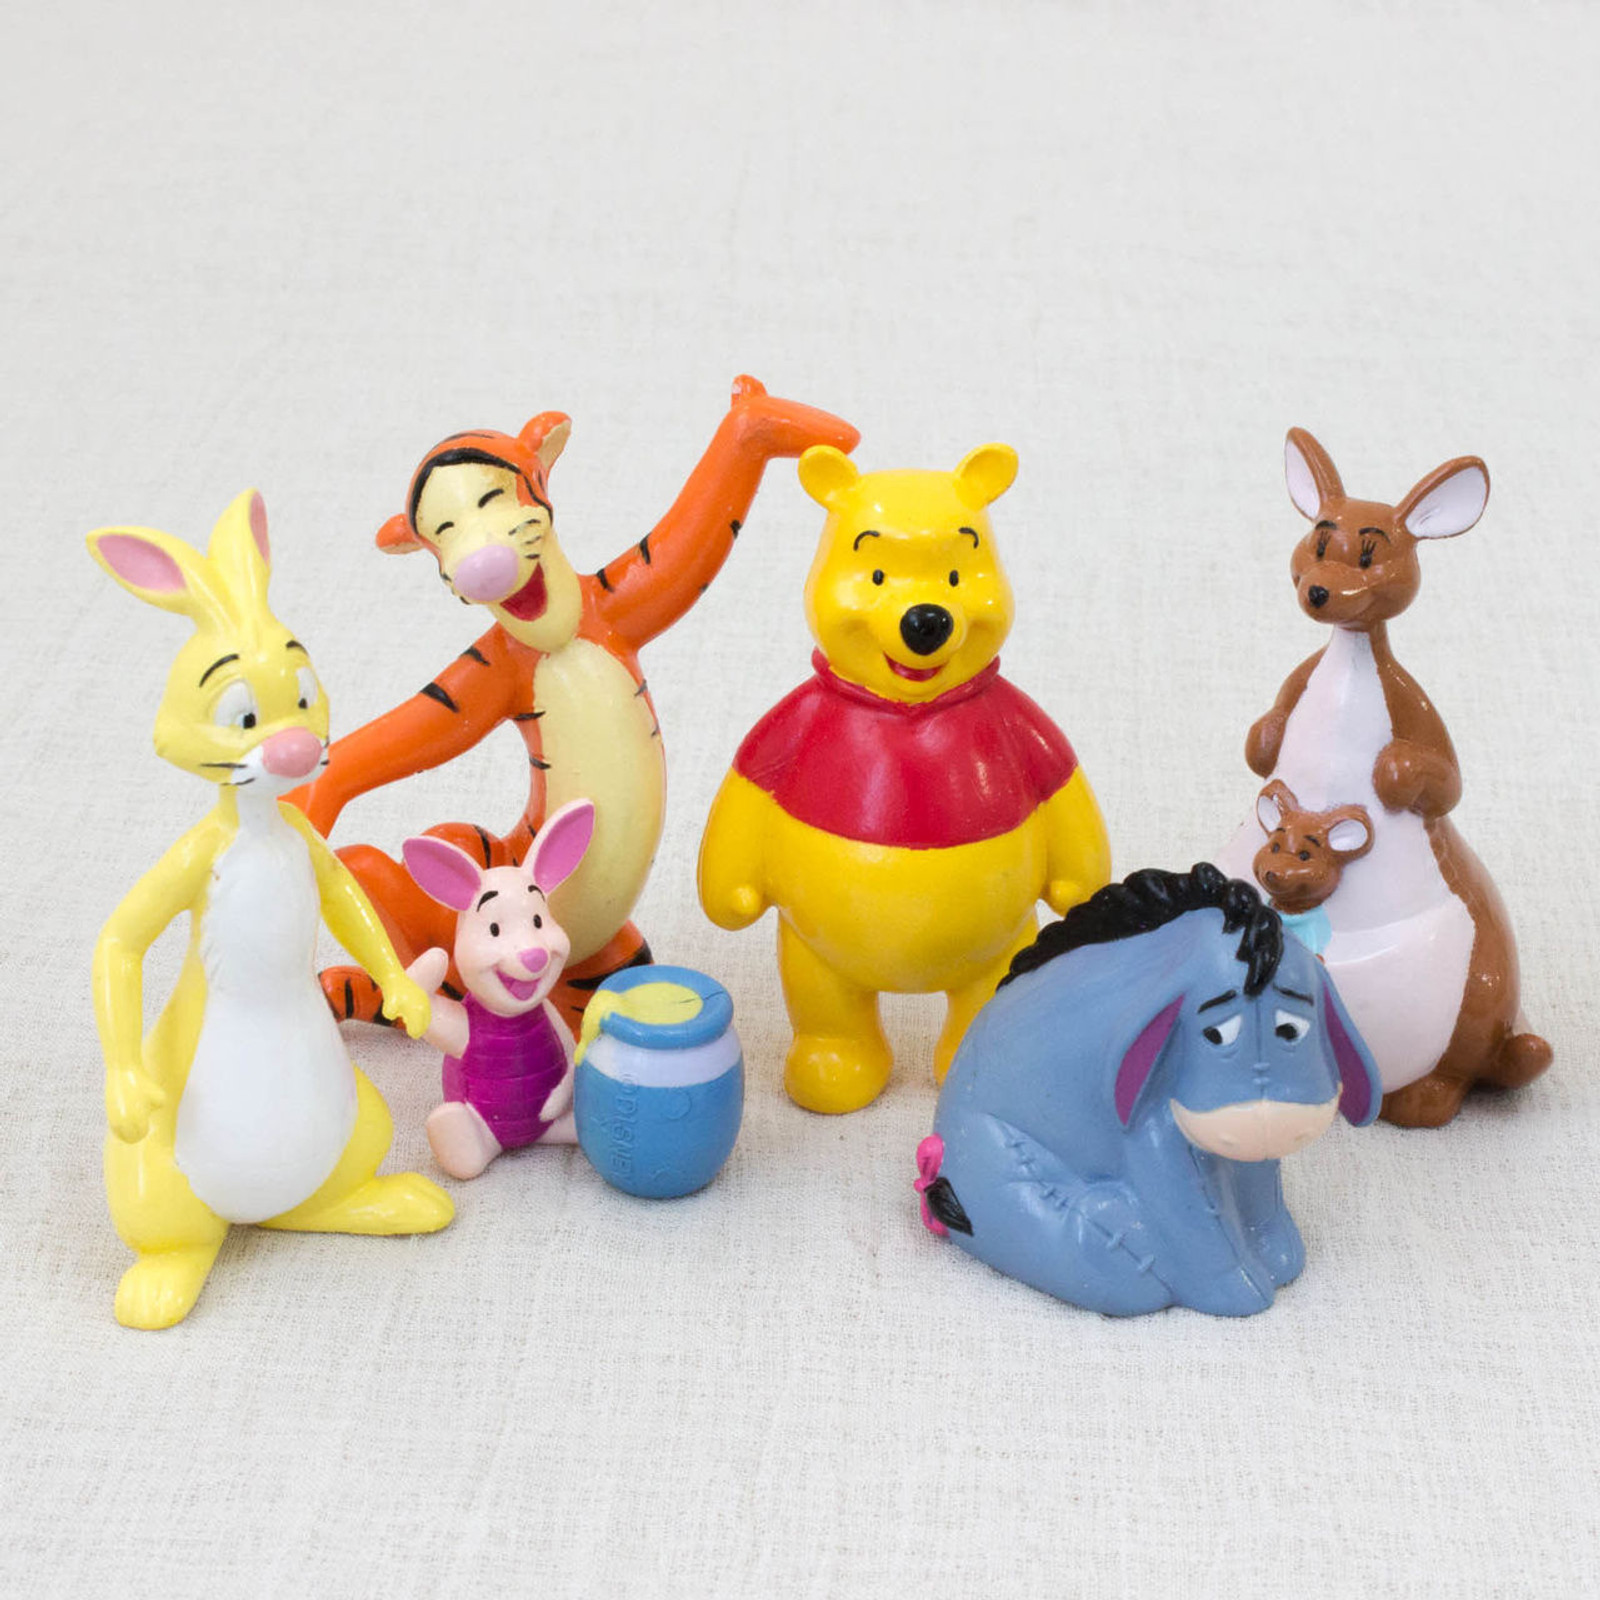 RARE! Winnie the Pooh Movie Friends Mini Figure Set Yutaka JAPAN